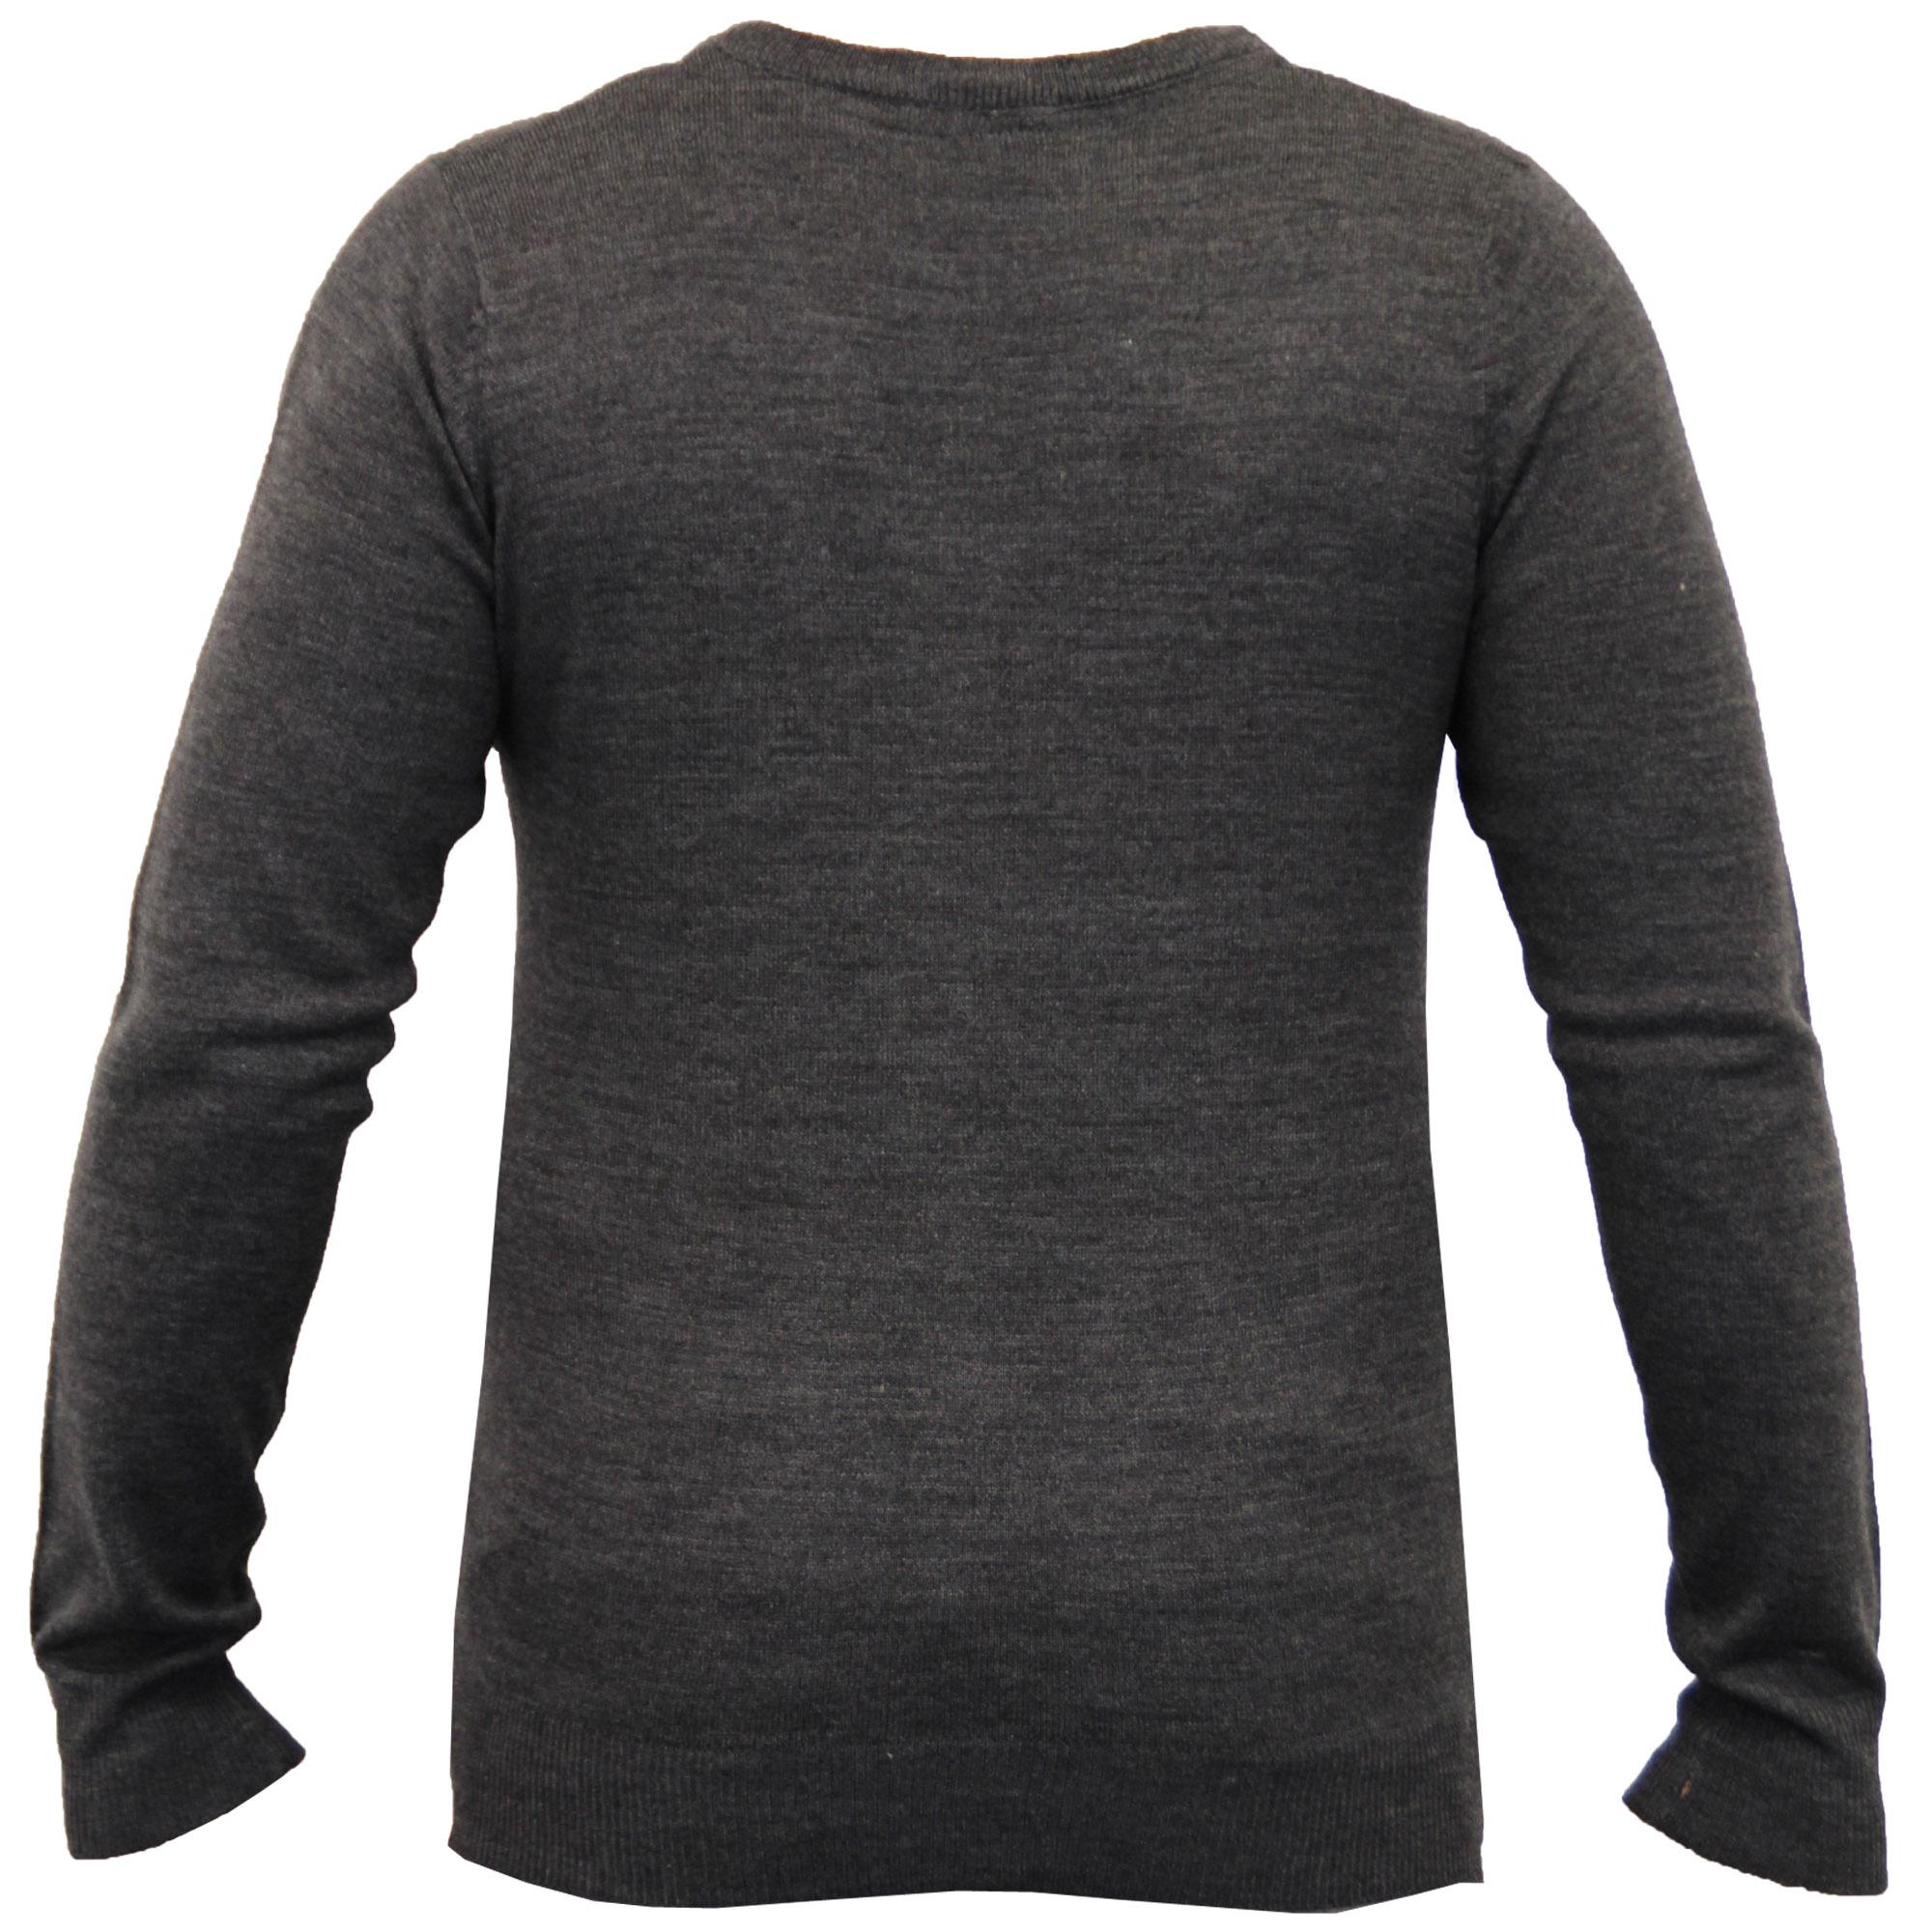 Mens-Jumper-Soul-Star-Knitted-Sweater-Pullover-Crew-V-Neck-Lightweight-Winter thumbnail 3